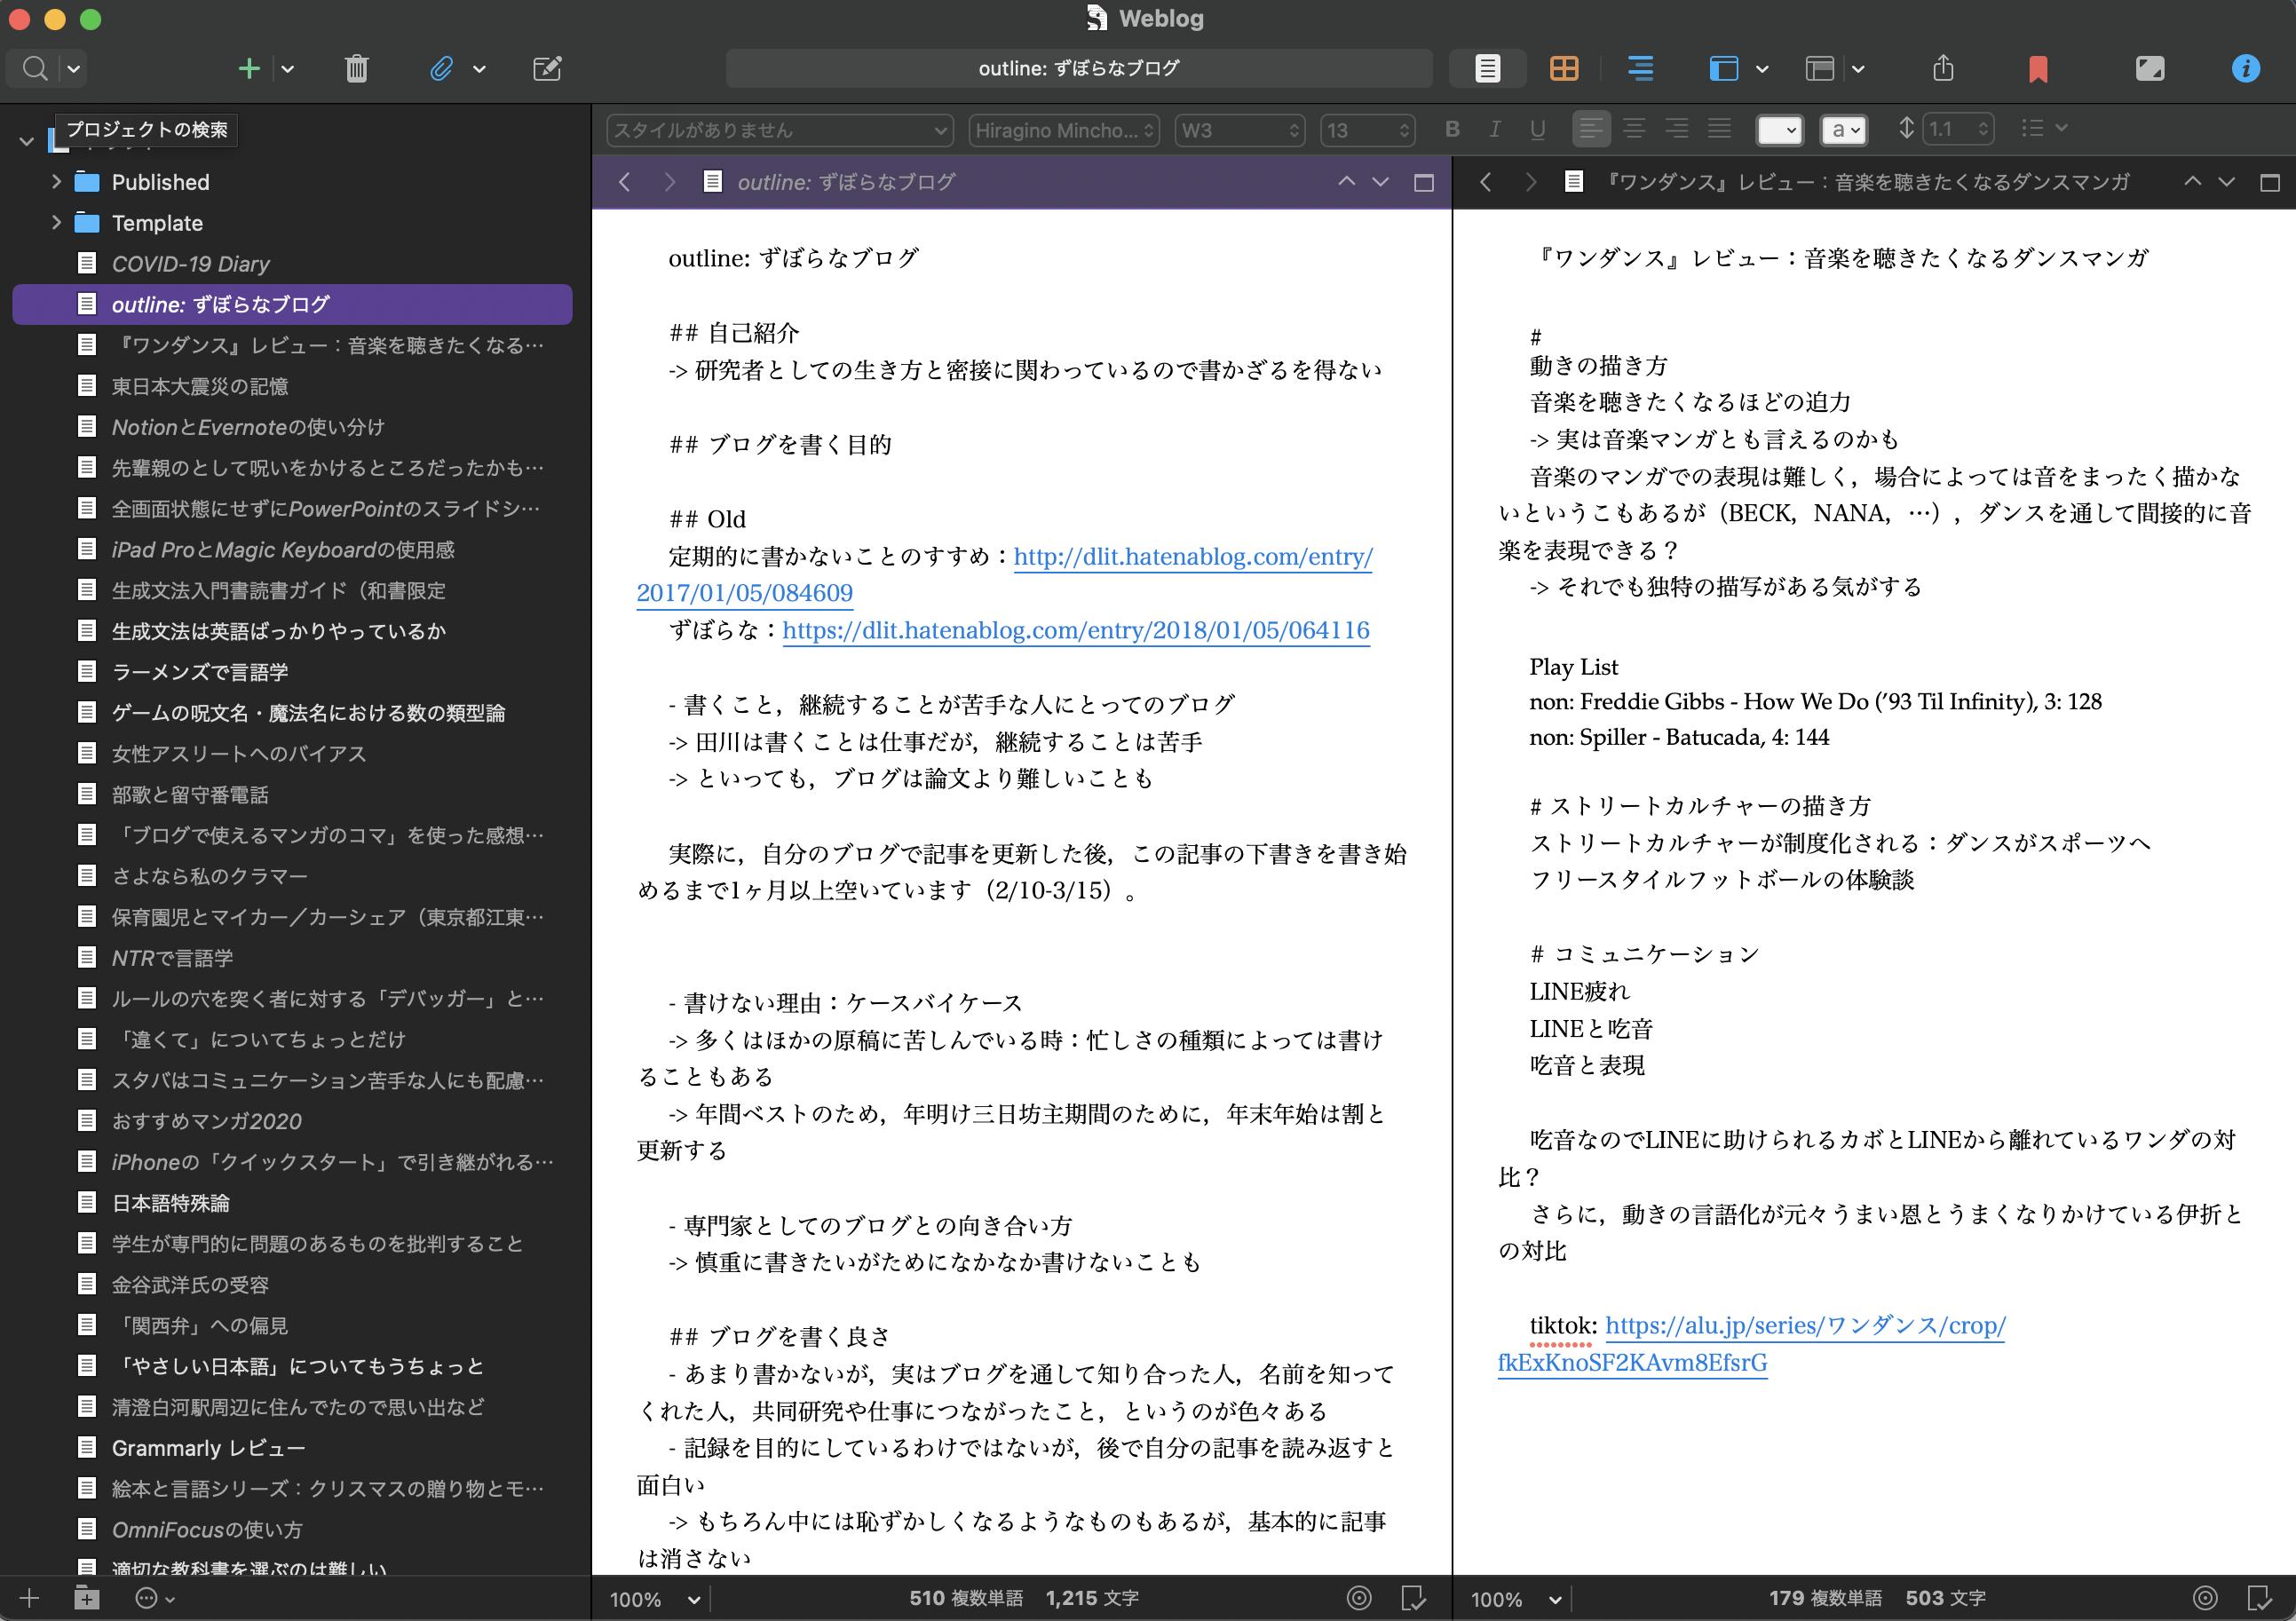 Scrivenerの作業画面スクリーンショット